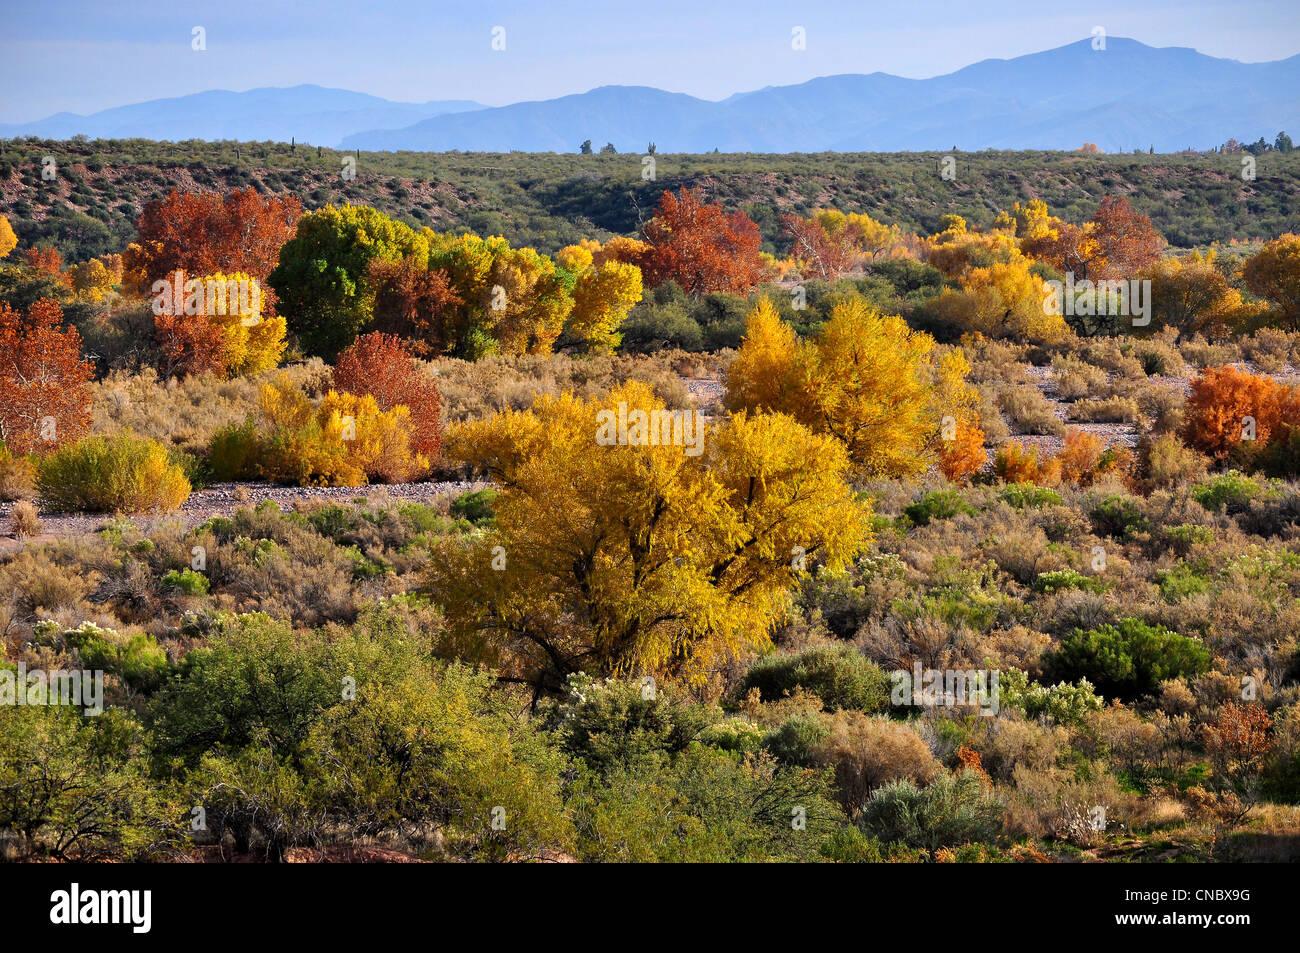 Arizona Desert landscape with cactus in autumn - Stock Image